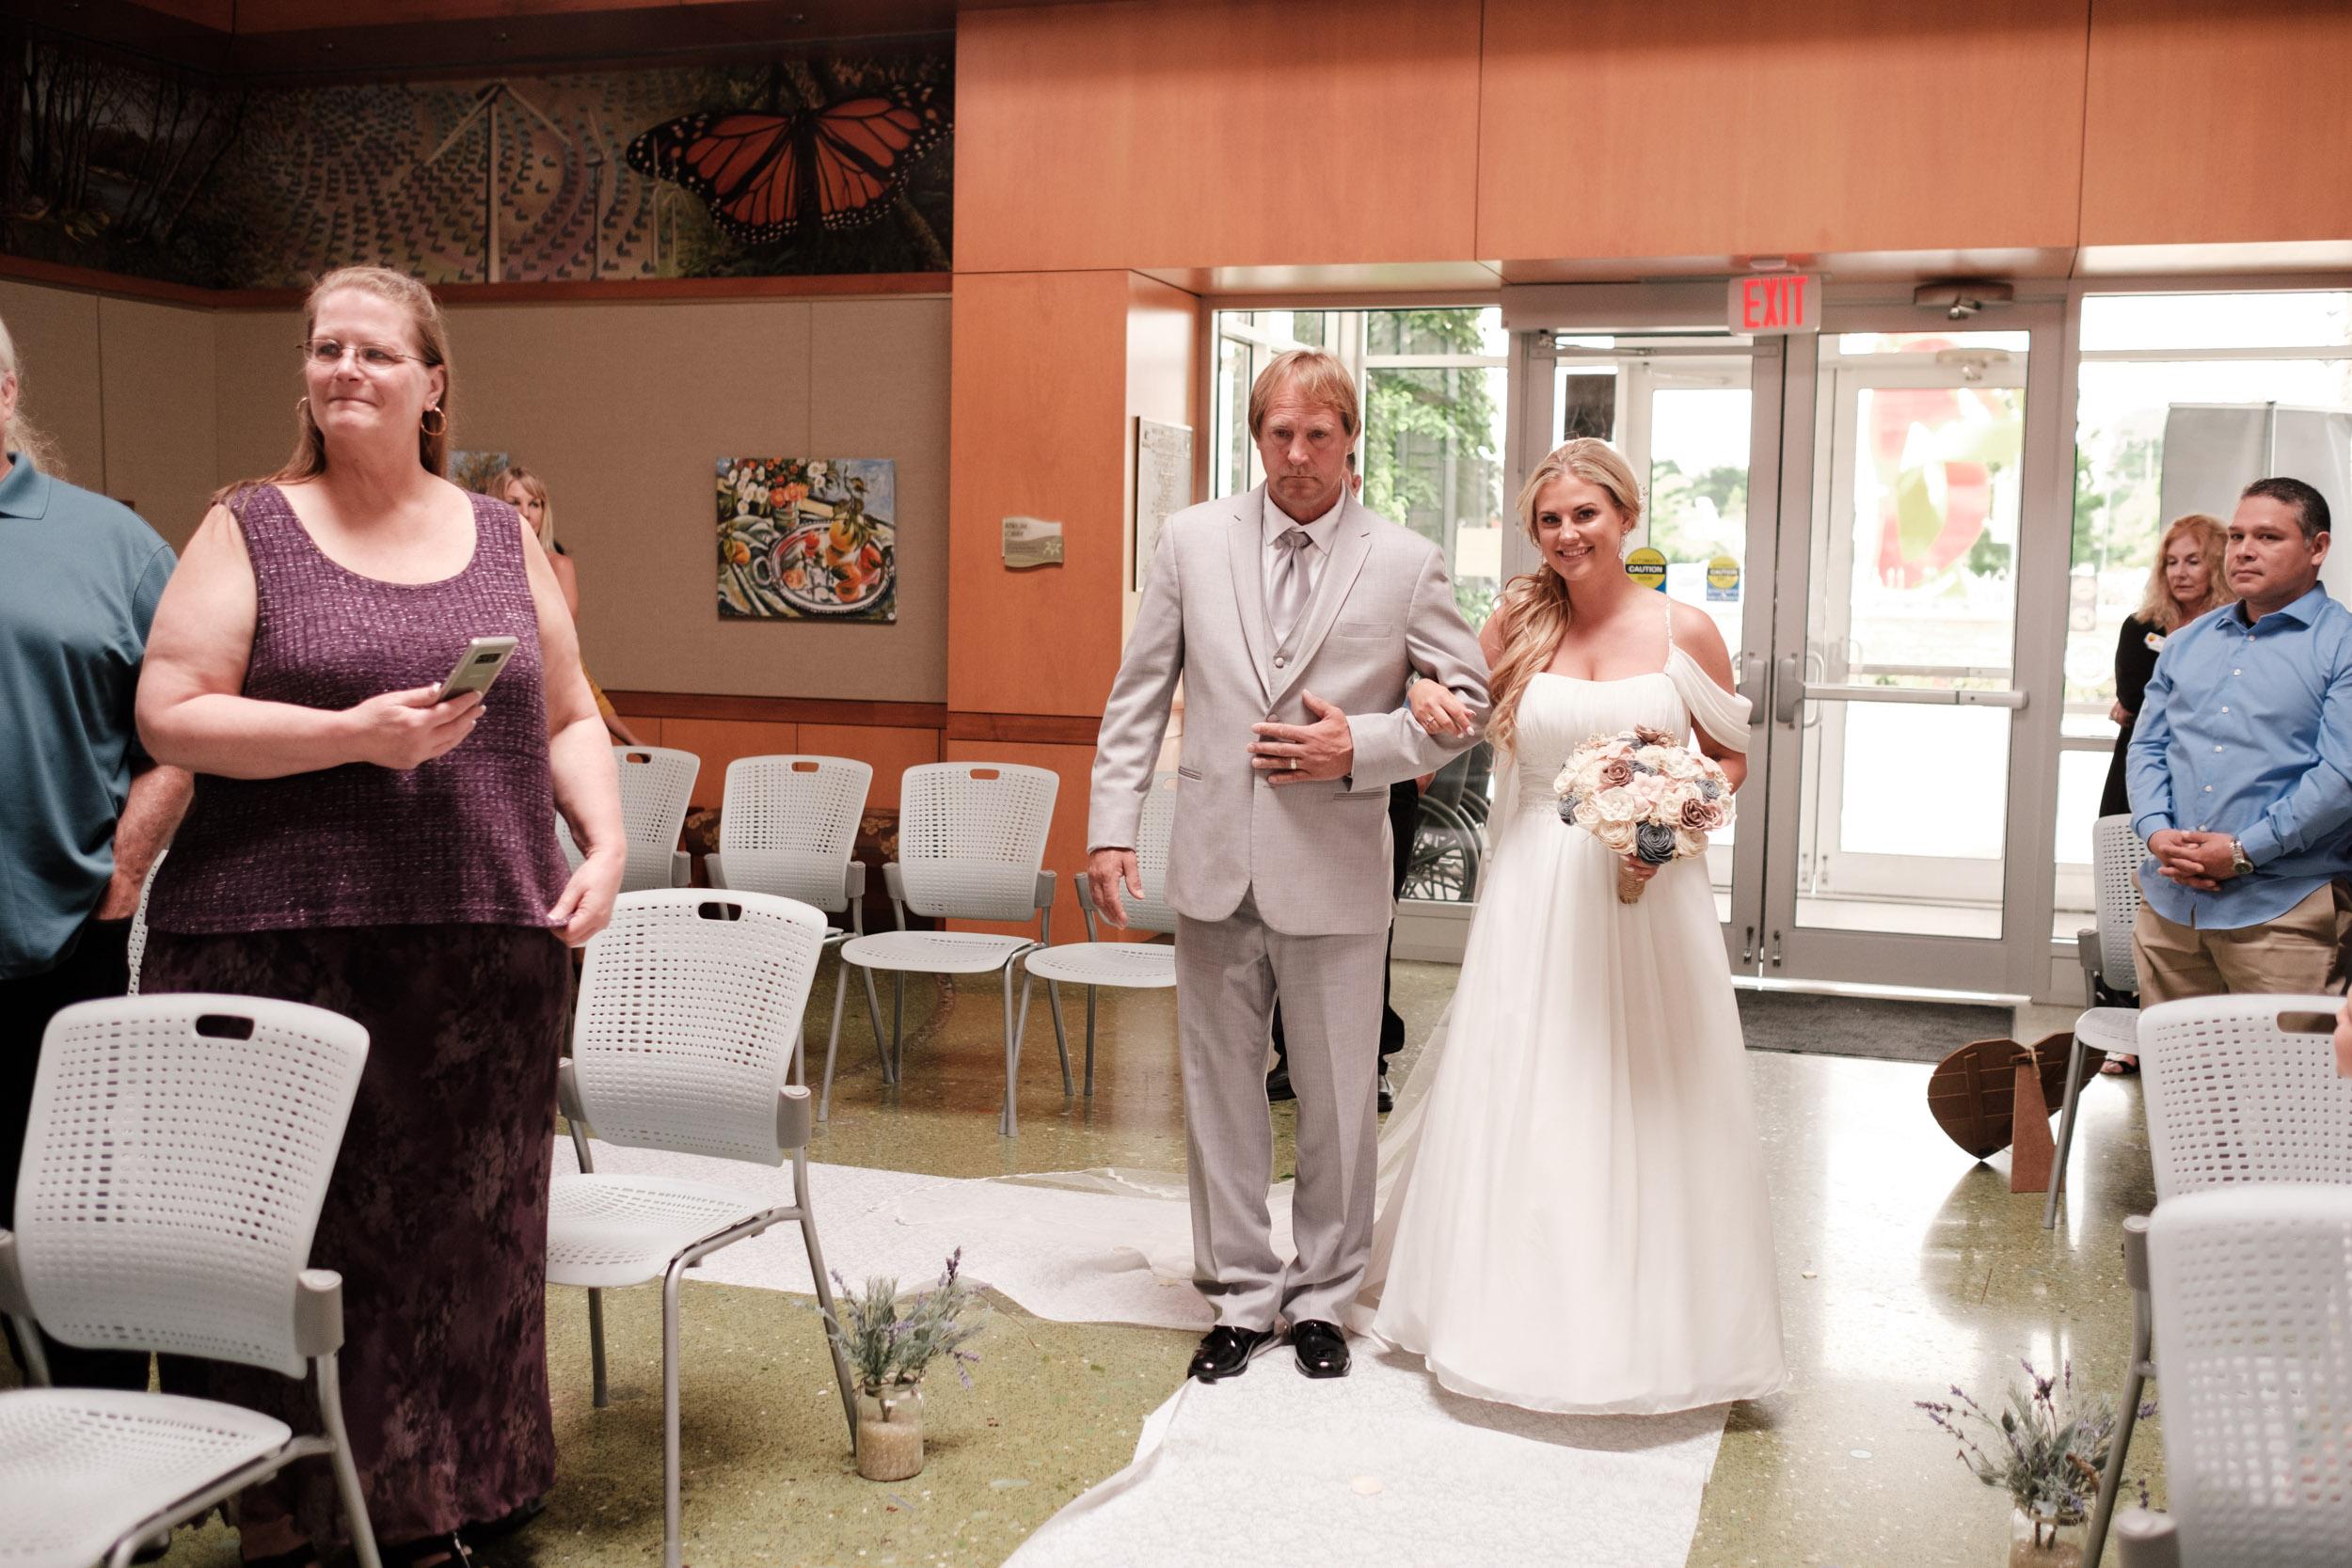 19-06-01 Megan Josh - Nicholas Conservatory Wedding-8.jpg